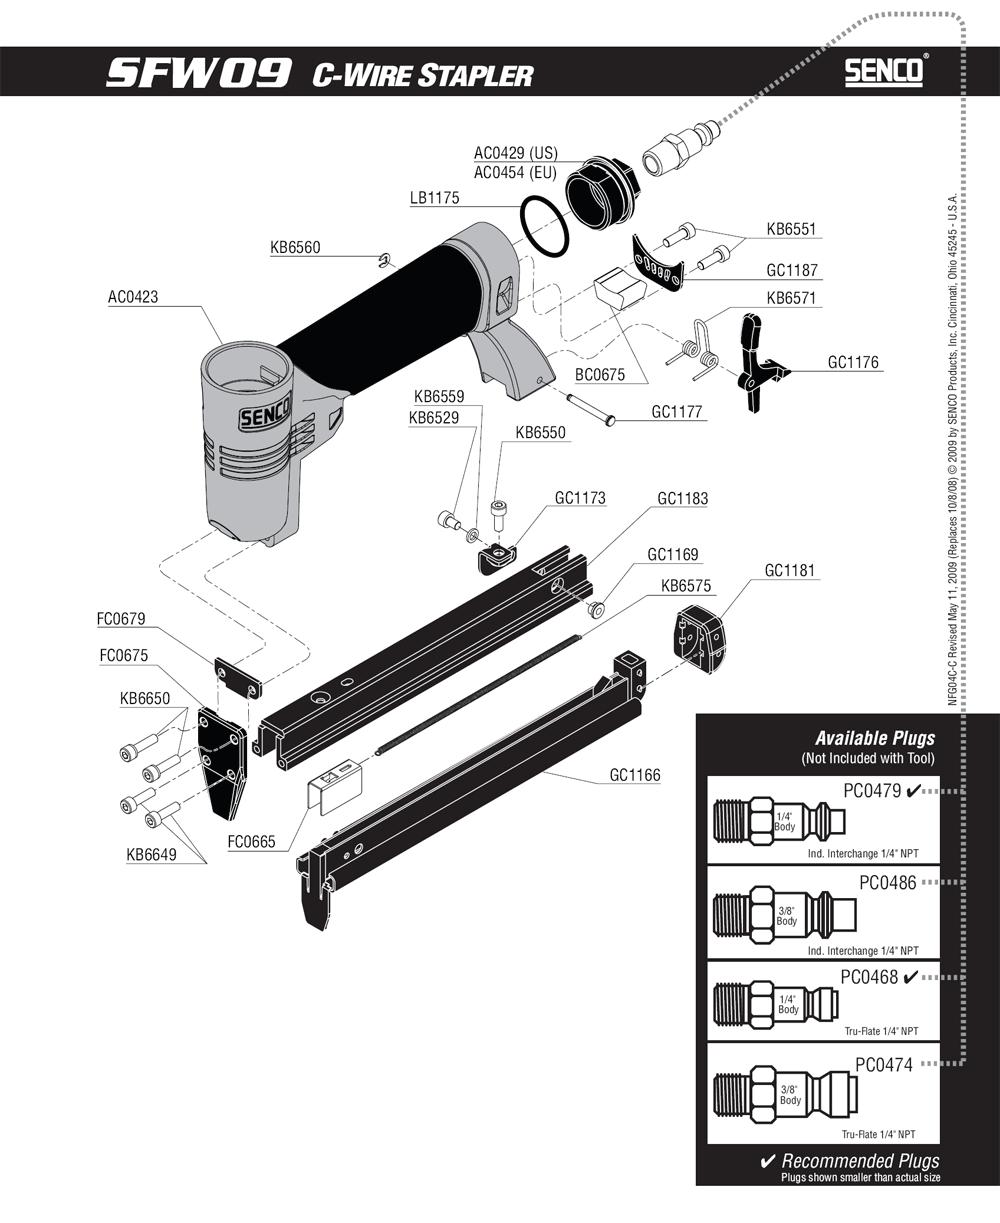 4C0012N-senco-PB-1Break Down